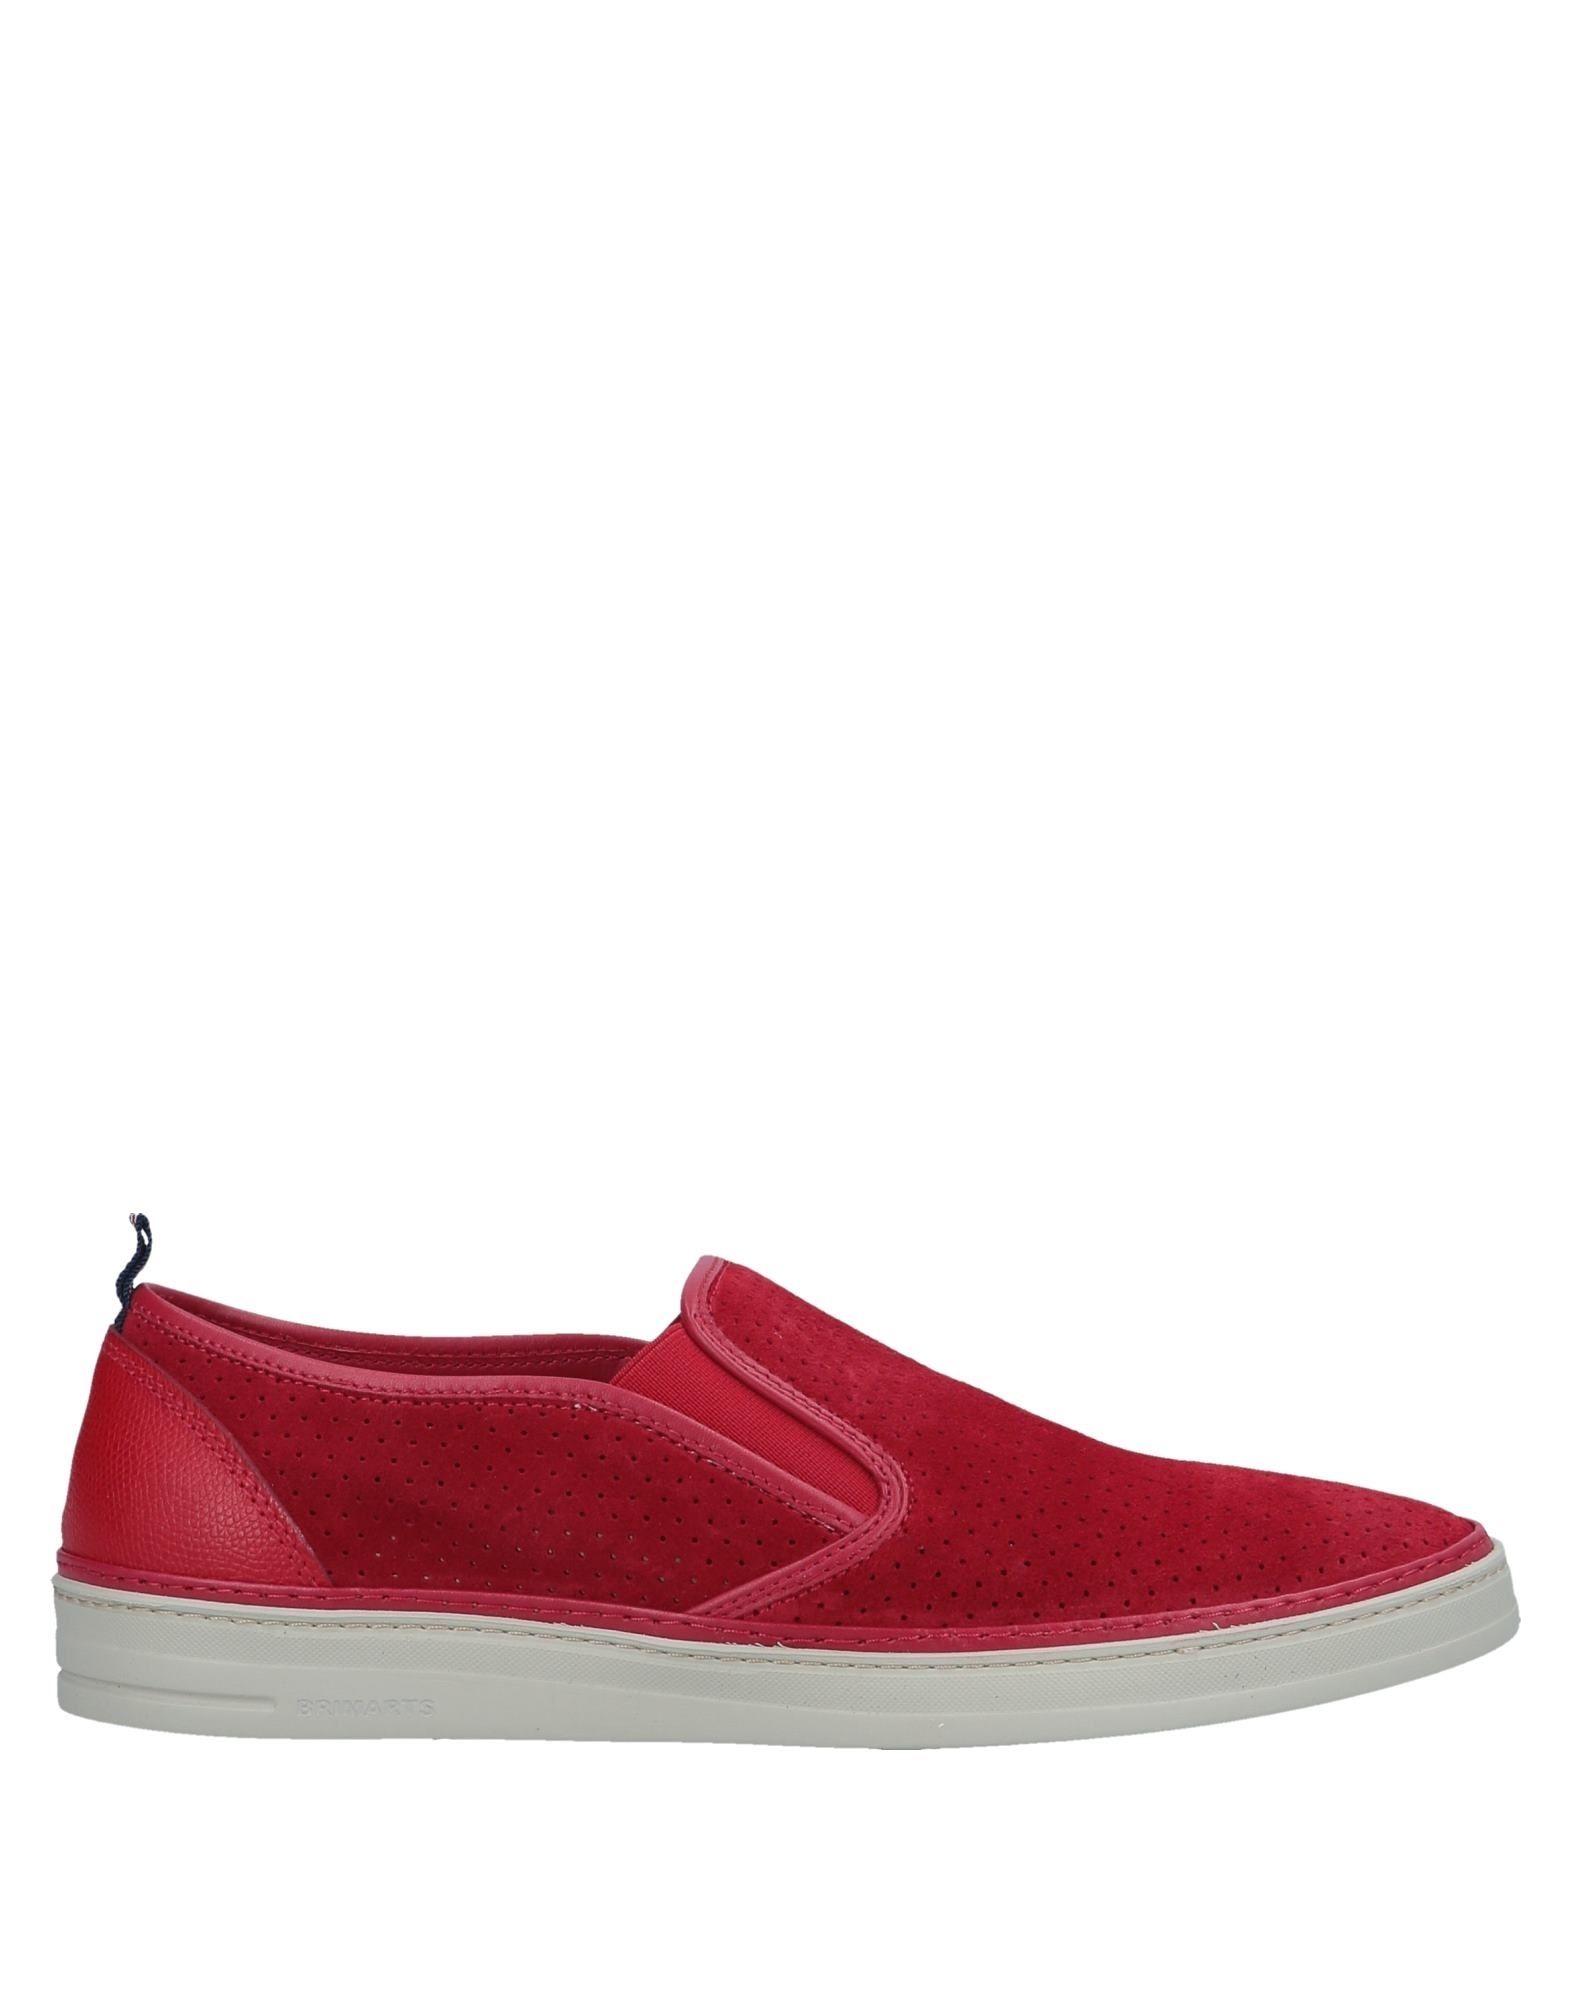 Rabatt Herren echte Schuhe Brimarts Sneakers Herren Rabatt  11232576AC e6e464